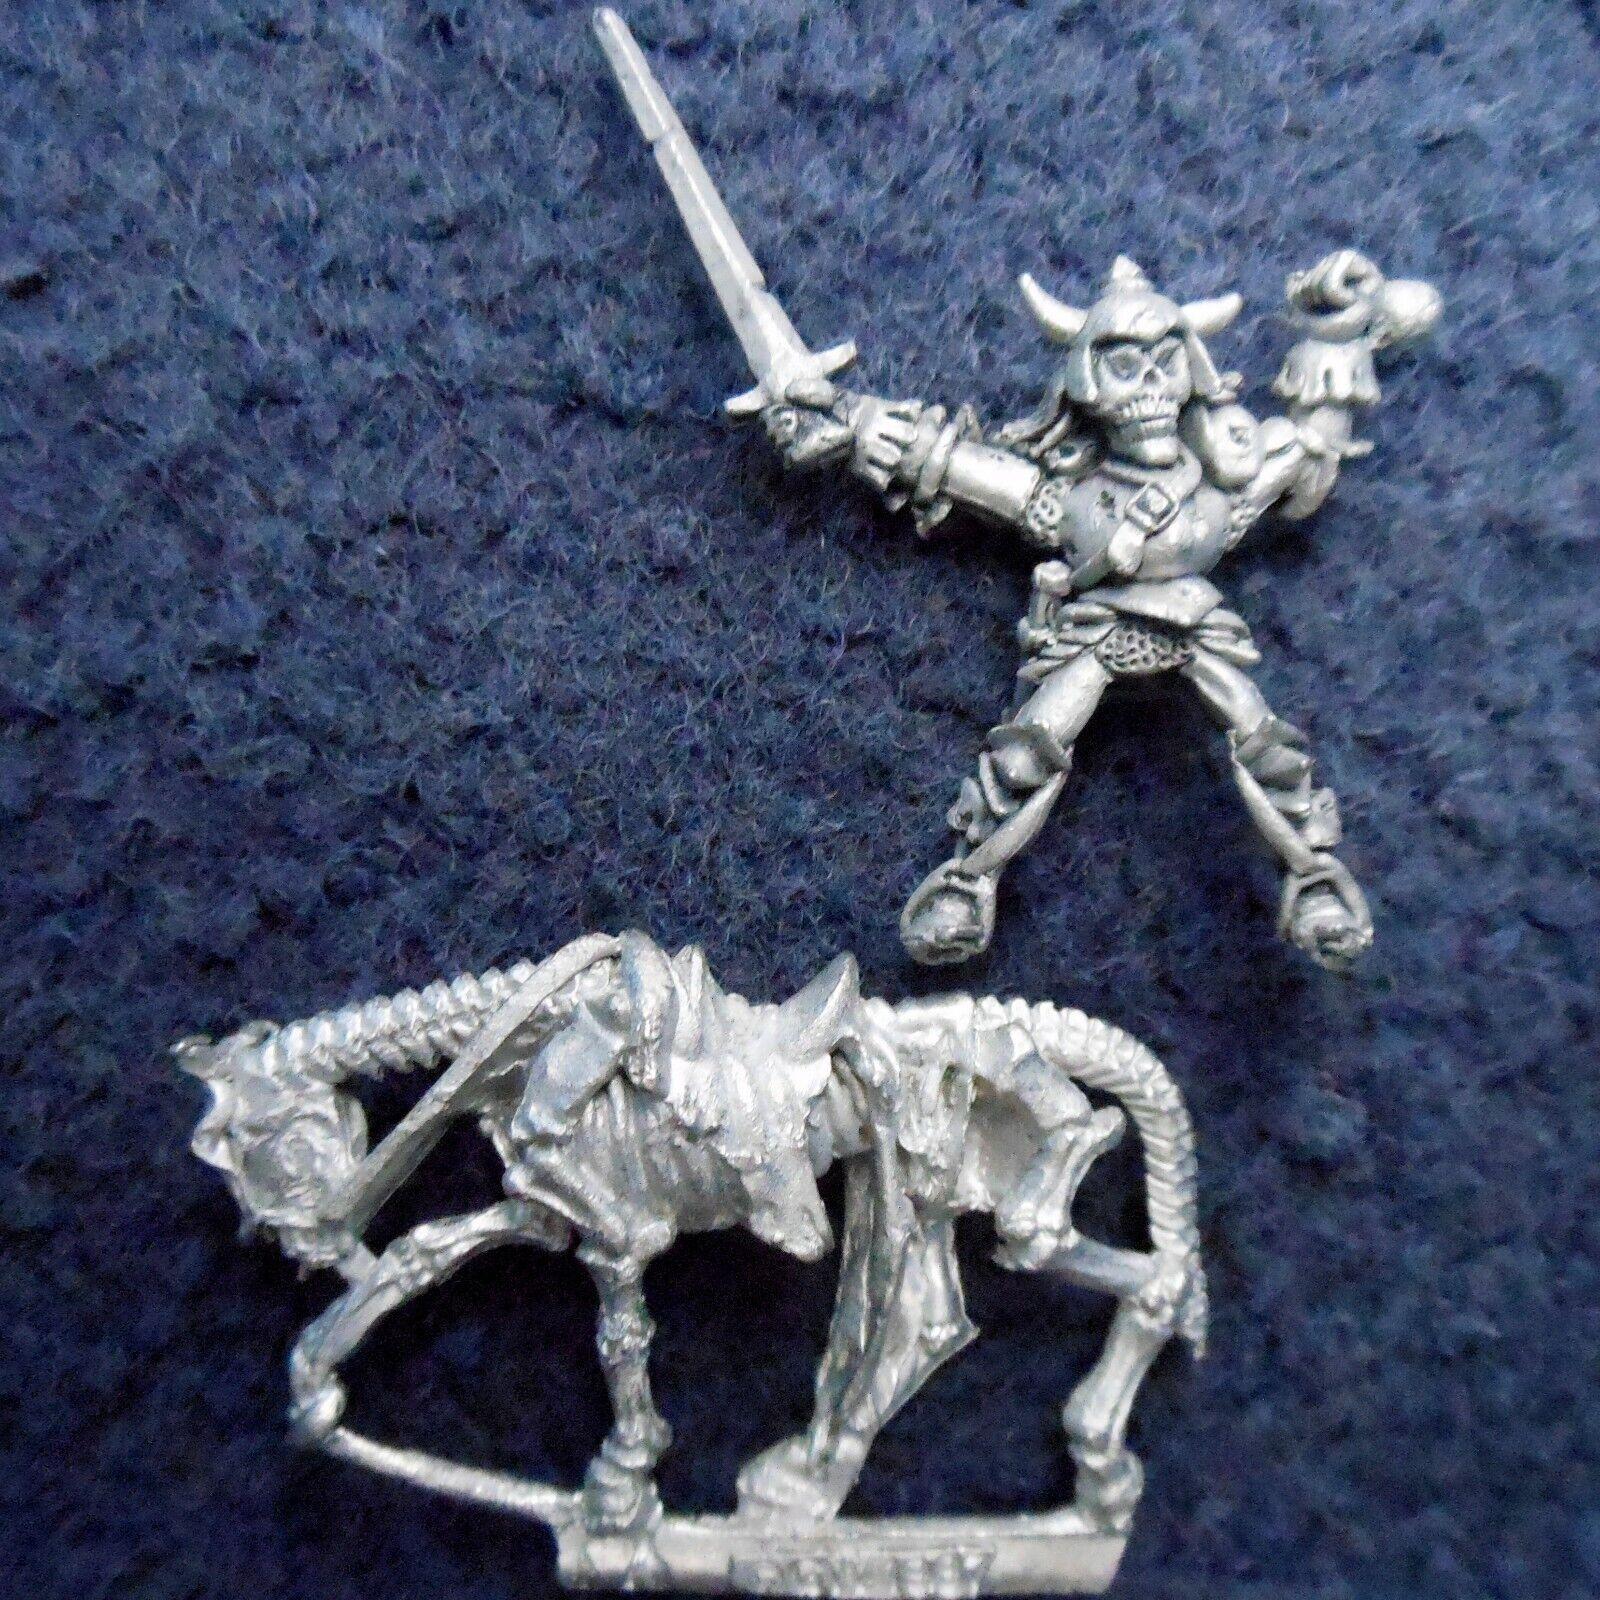 1987 Undead Cavalry C21 14 Skullface Mounted Skeleton Zombie Citadel Warhammer